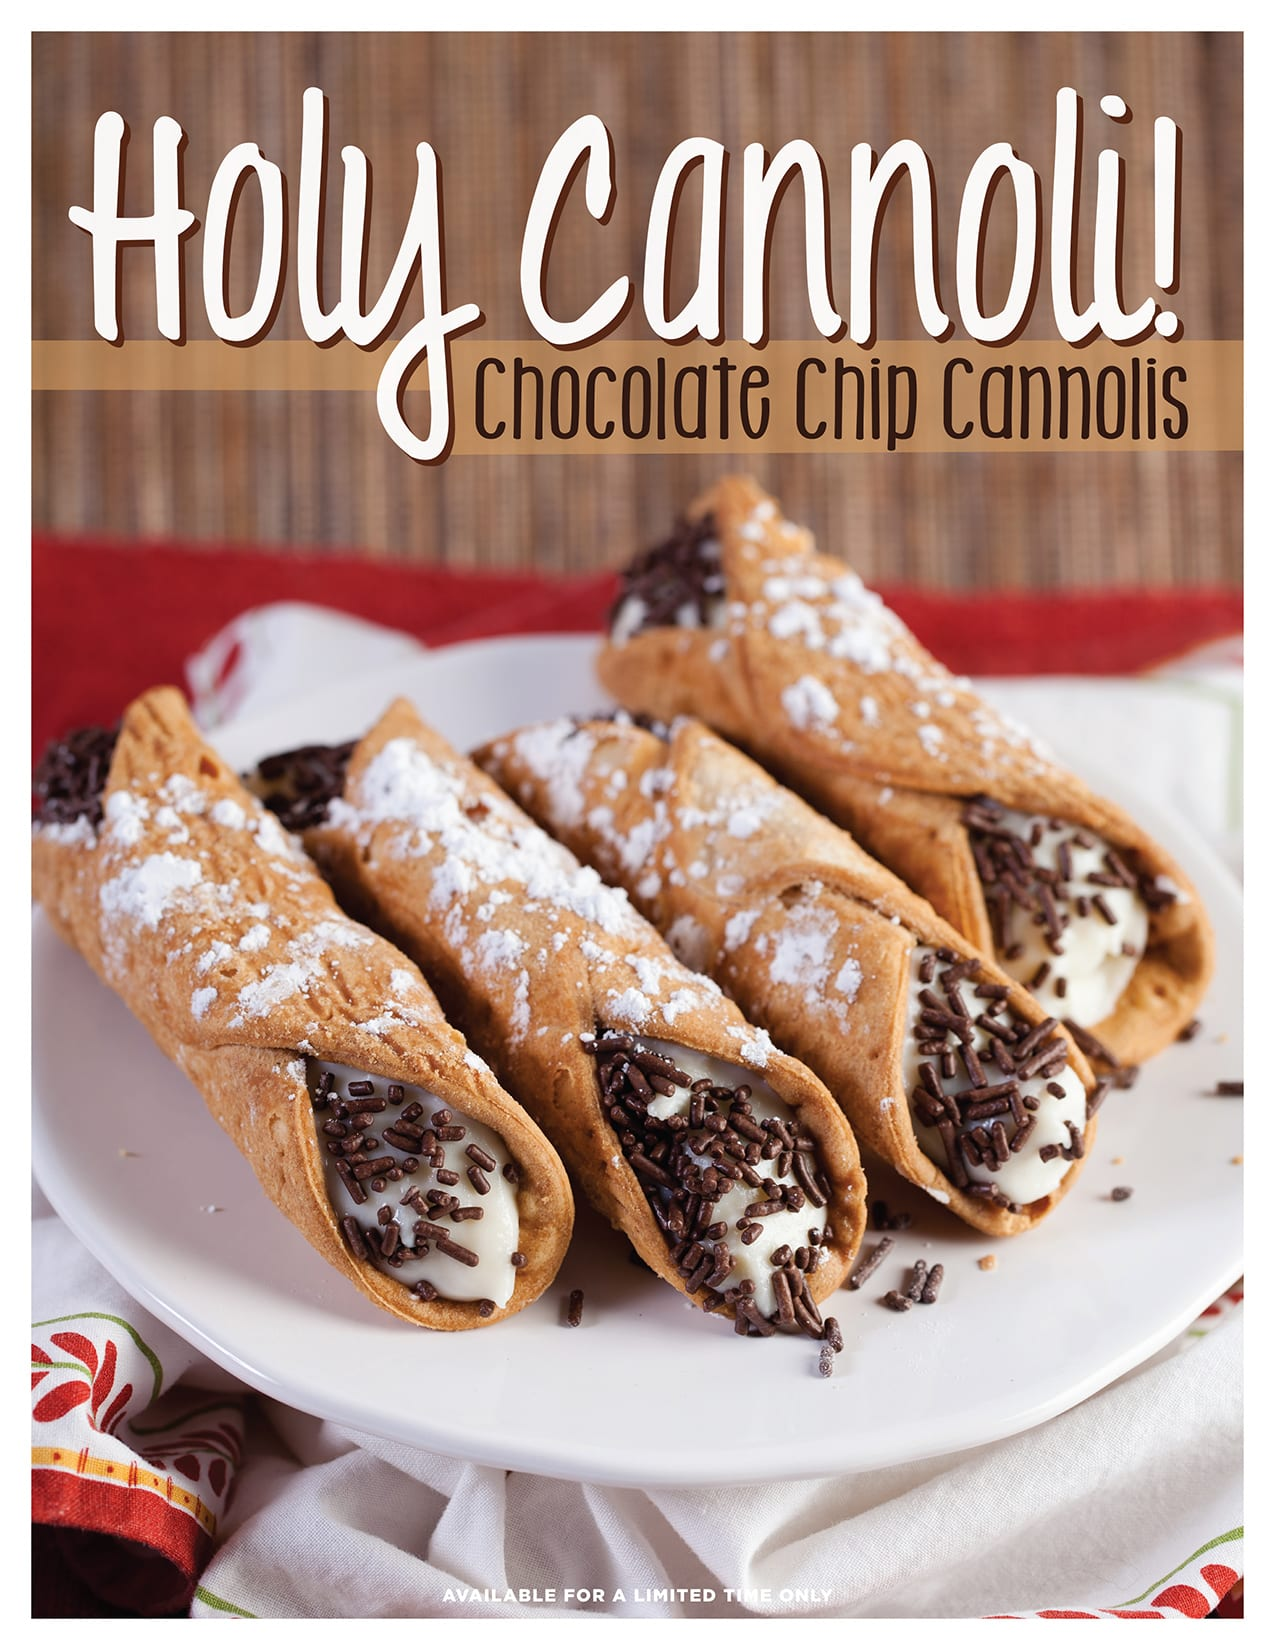 1604_april-LTOs_chocolate-chip-cannoli_8.5x11_static